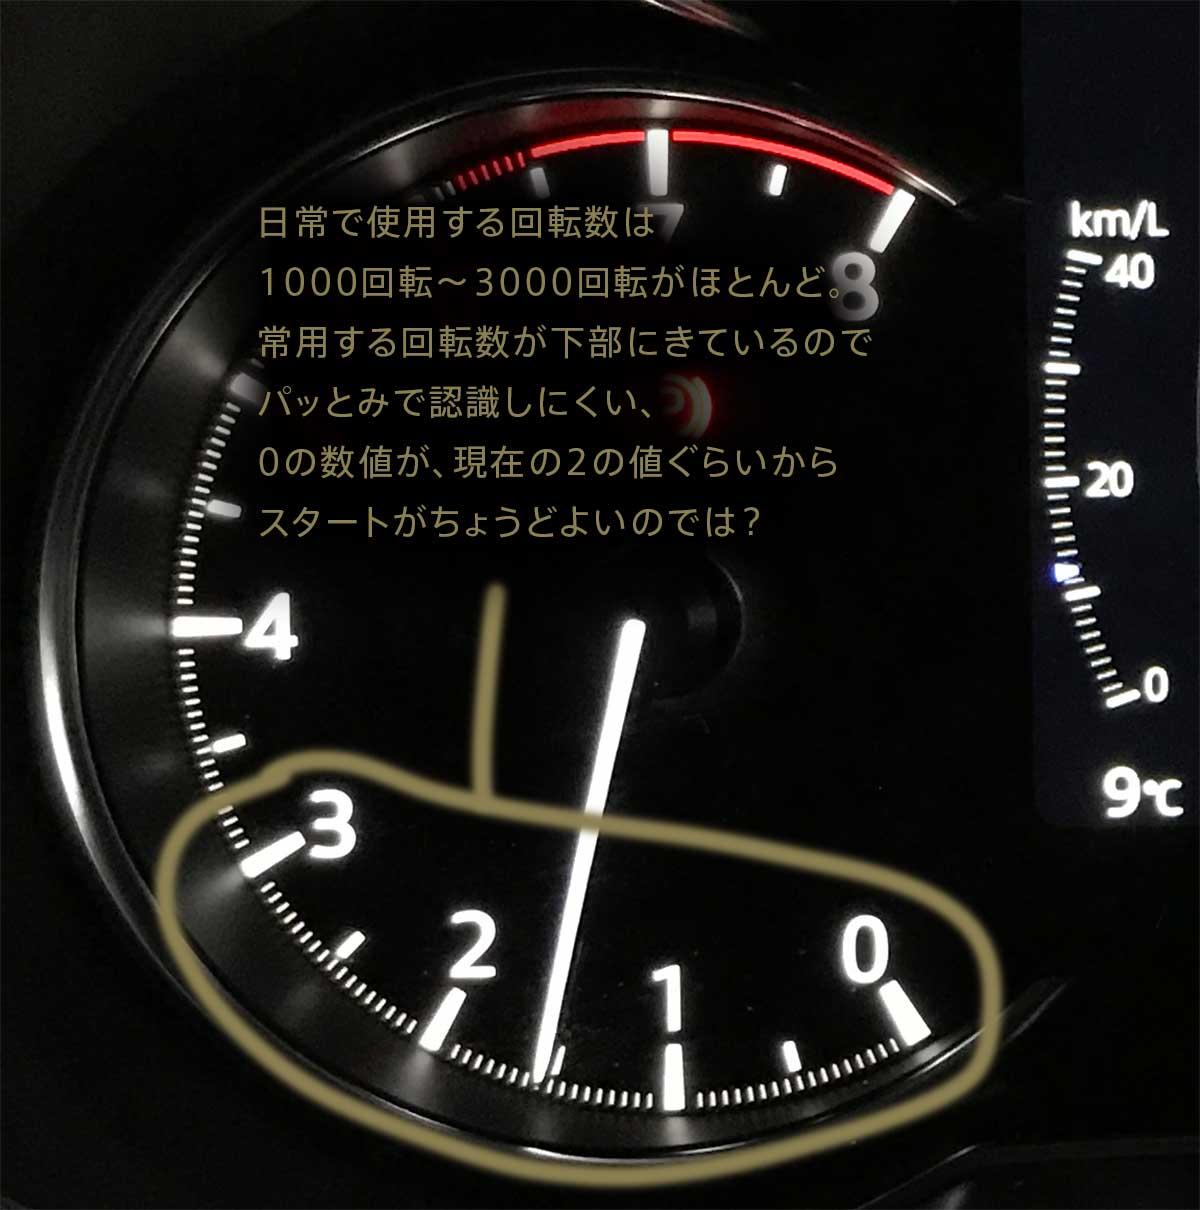 MAZDA CX-8を2台乗ってきて感じた!マツダのTFT液晶メーターの弱点や改善すべきポイントとは? mazda_cx-8_cx8_tft_lcd_meter_04